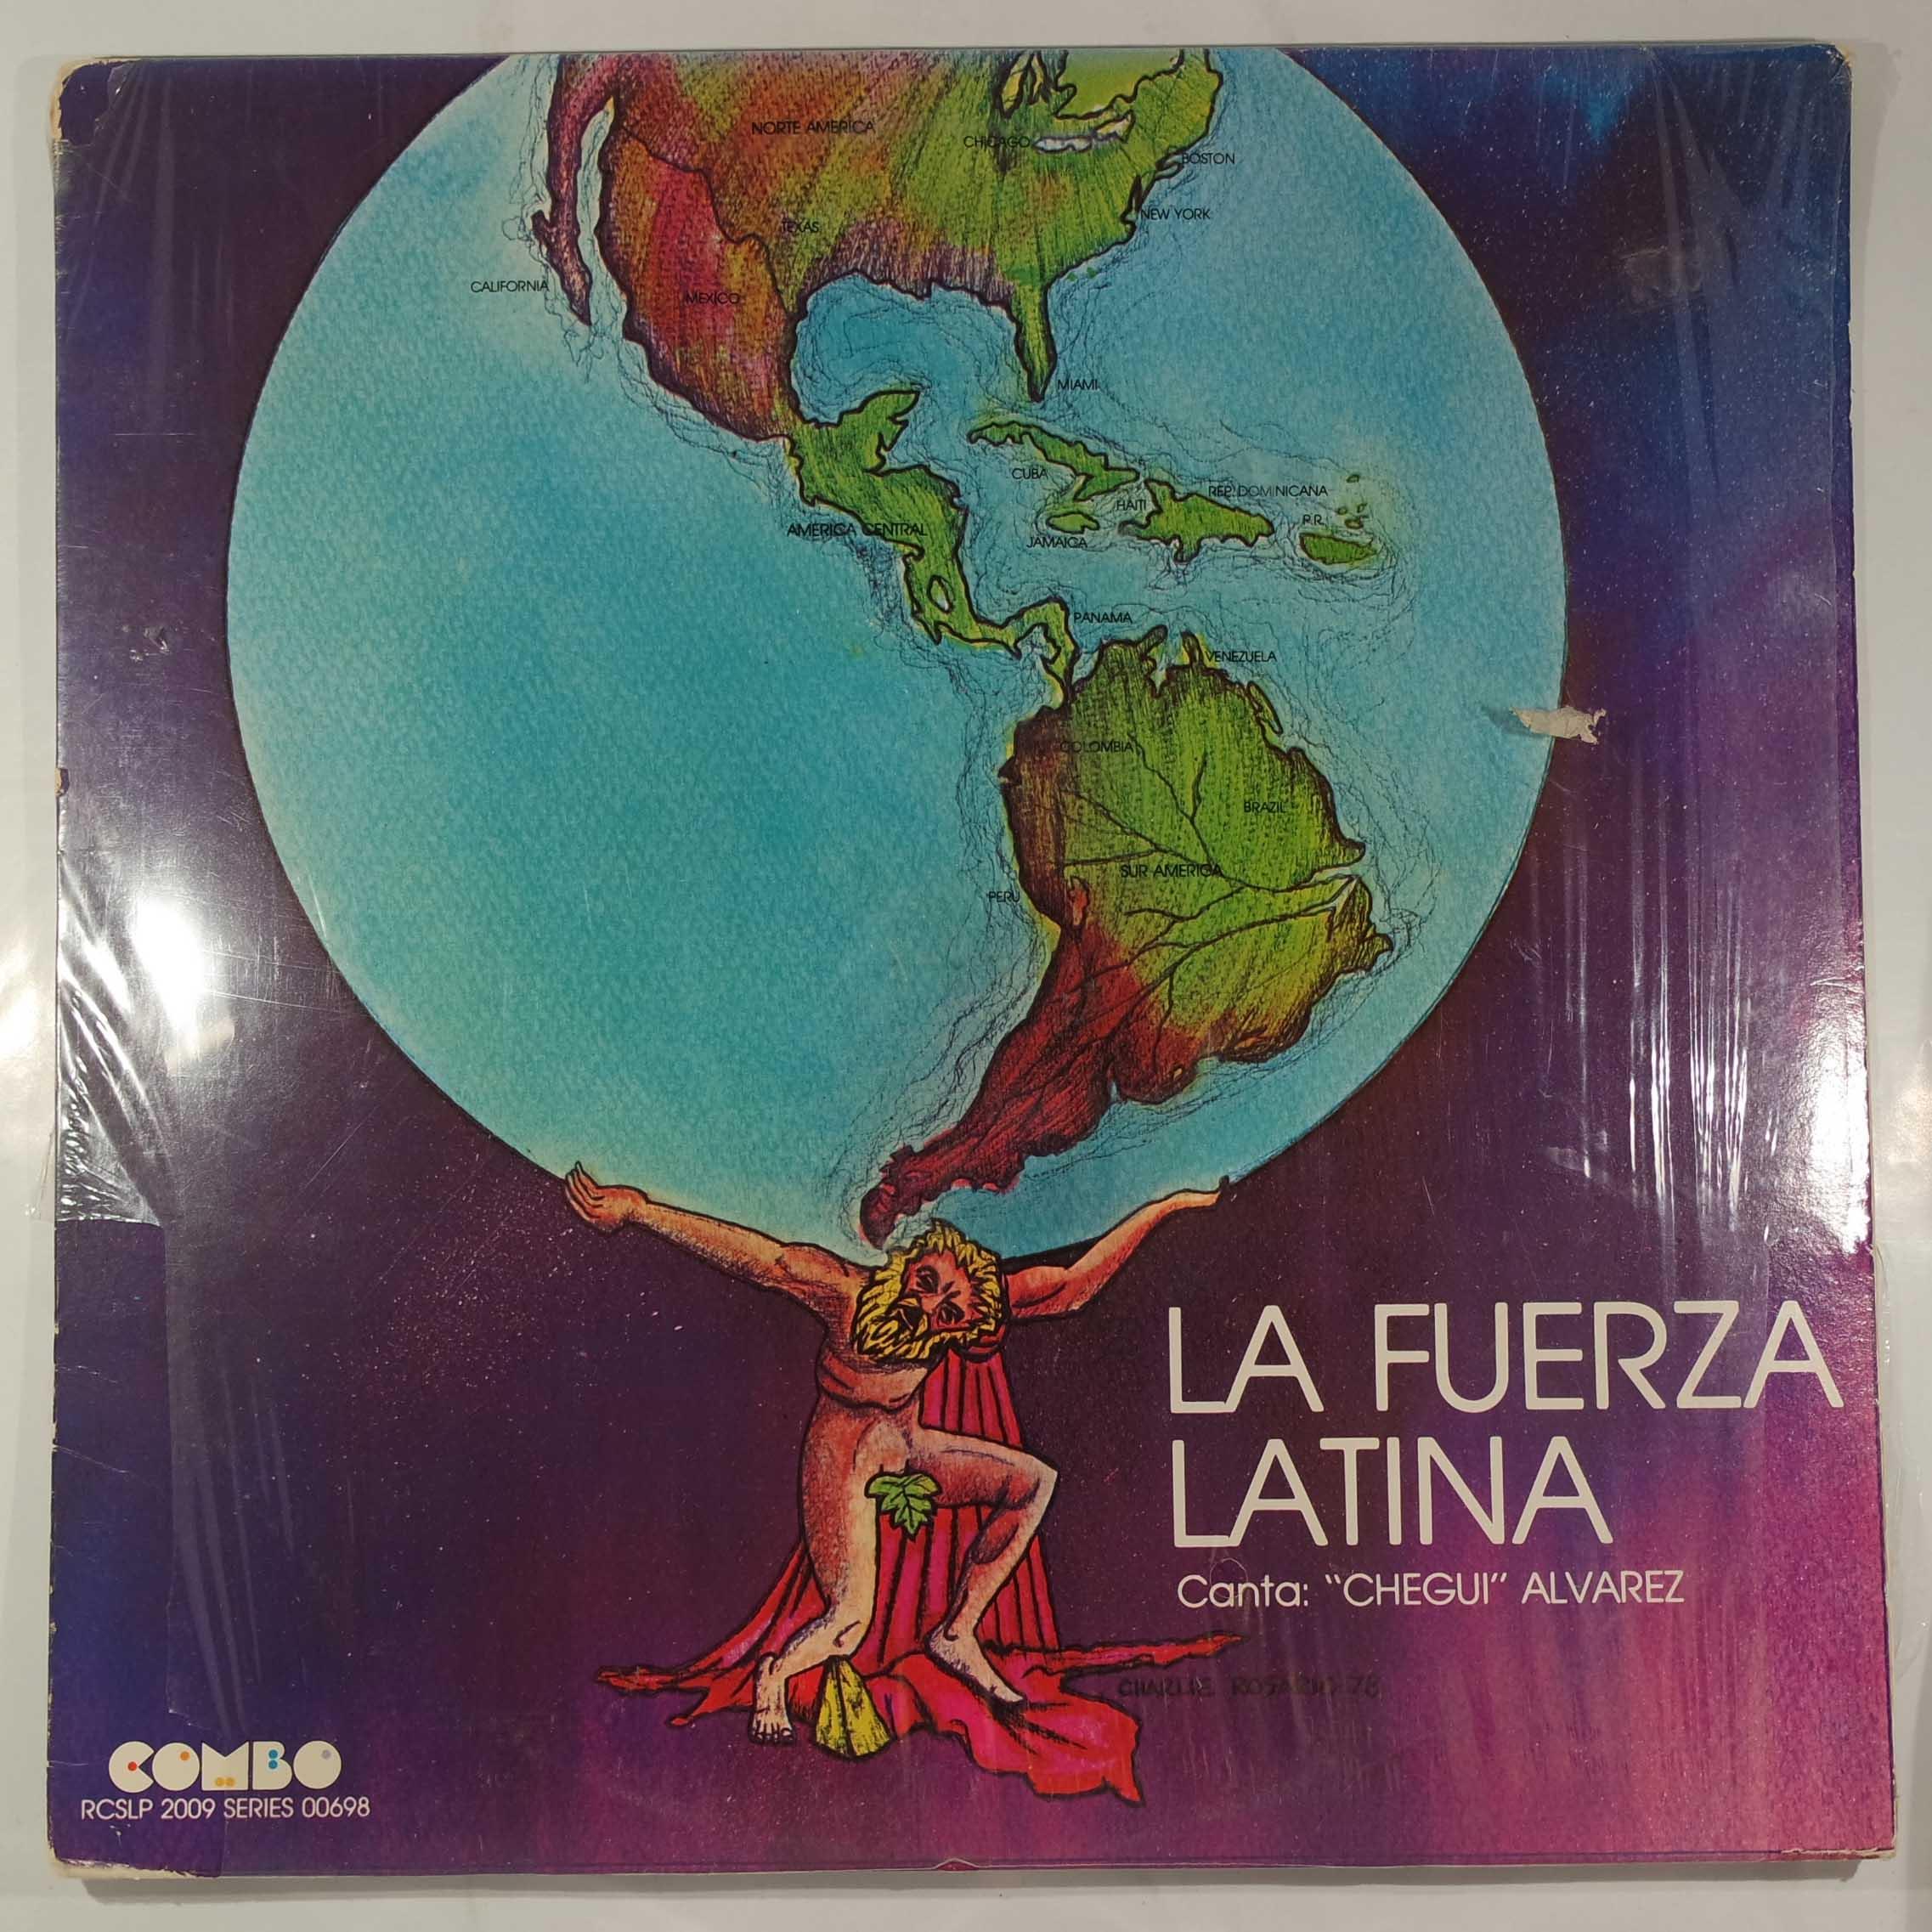 LA FUERZA LATINA - Same - LP